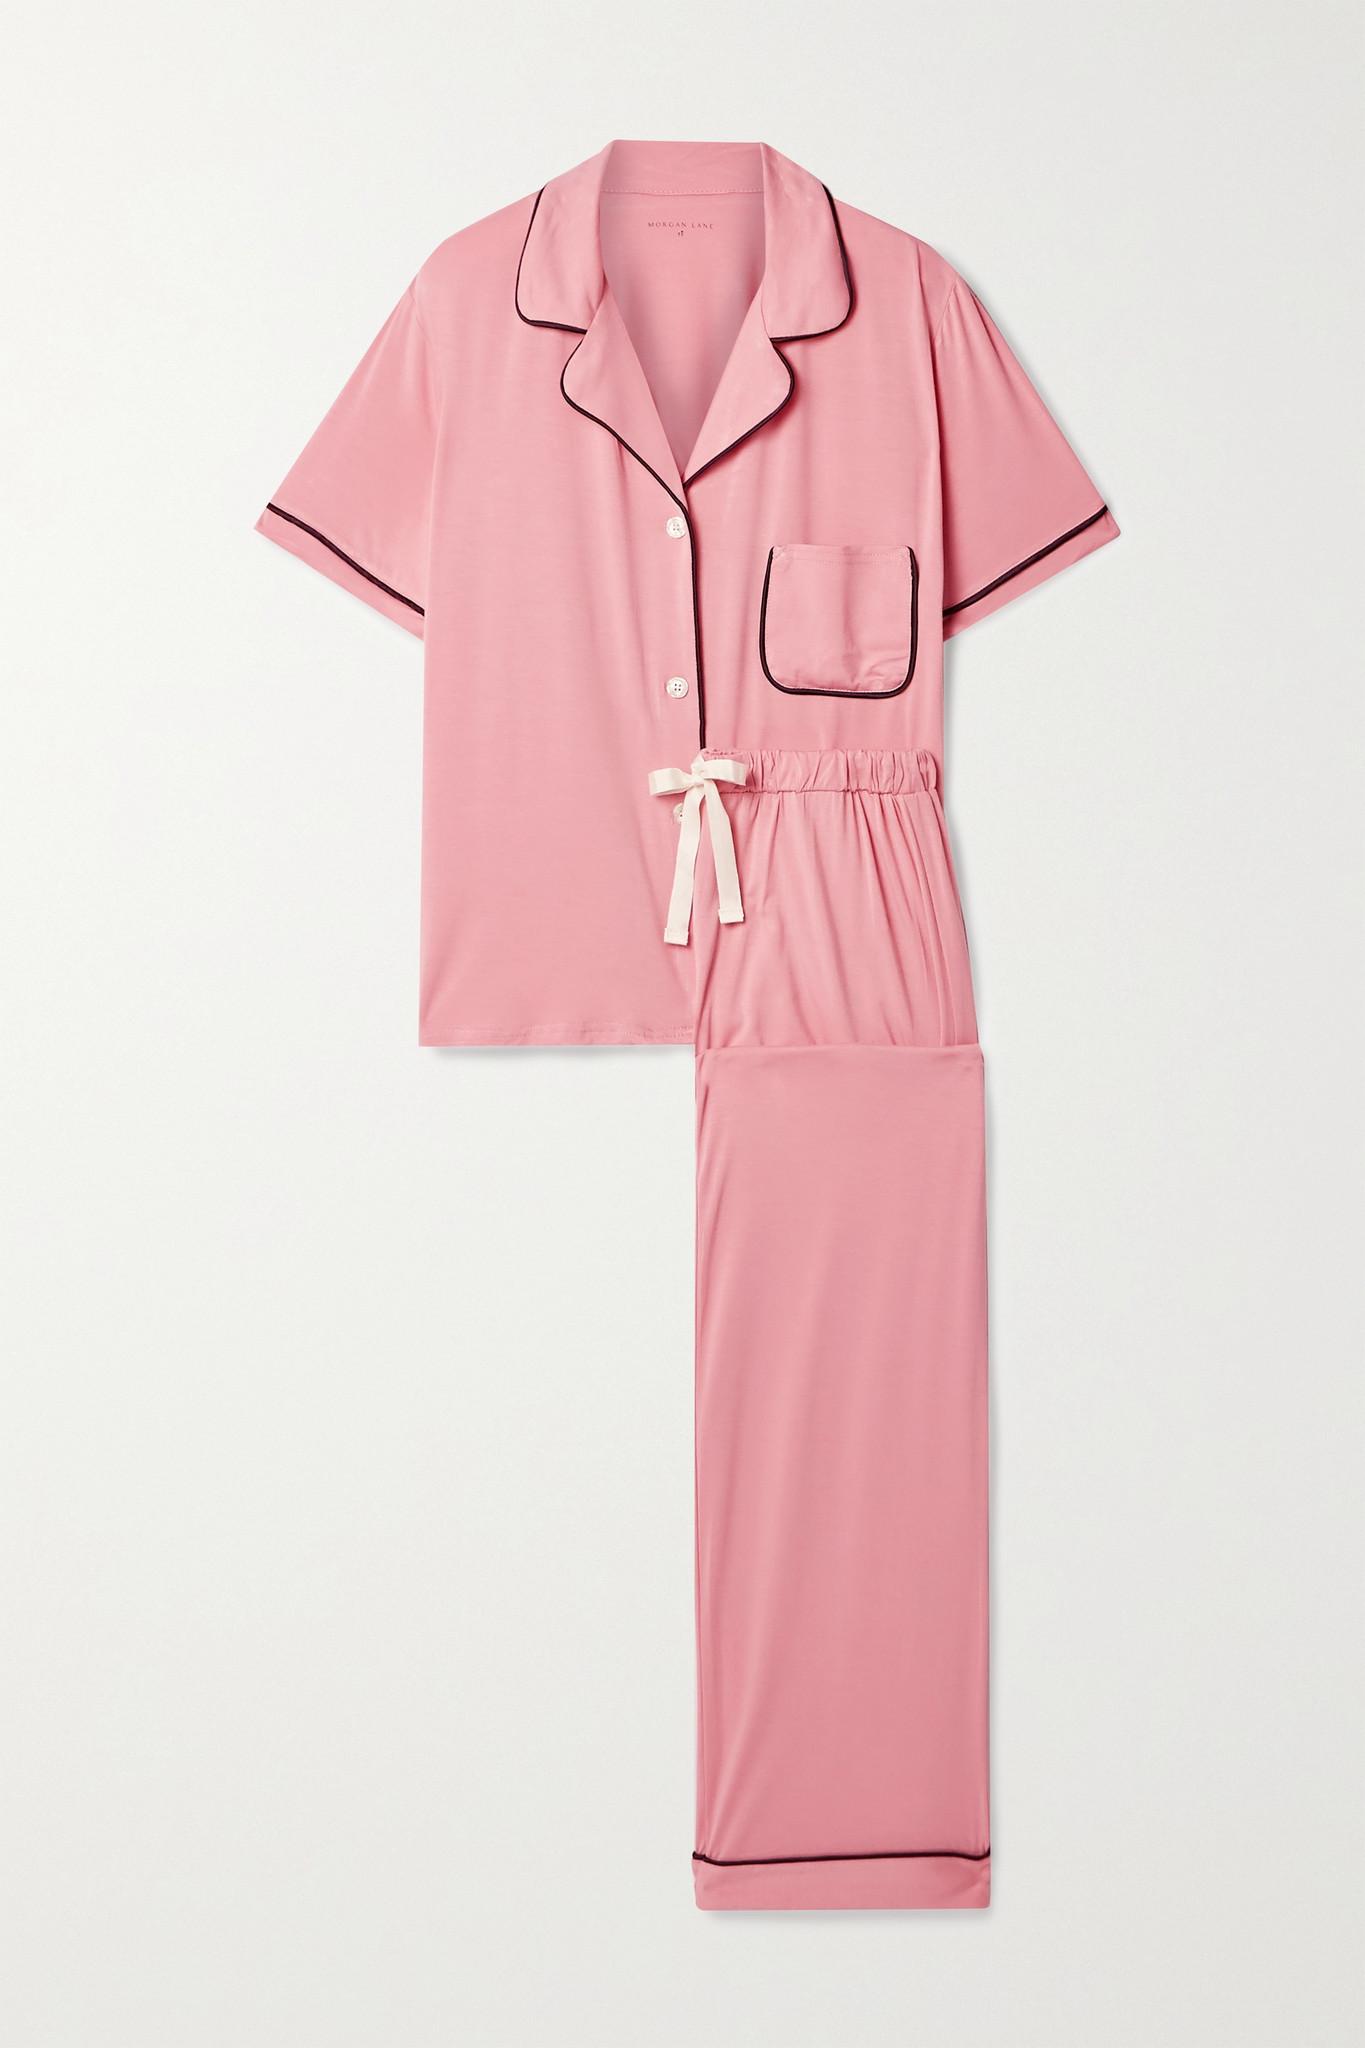 MORGAN LANE - Katelyn Chantal Piped Stretch-jersey Pajama Set - Pink - x small